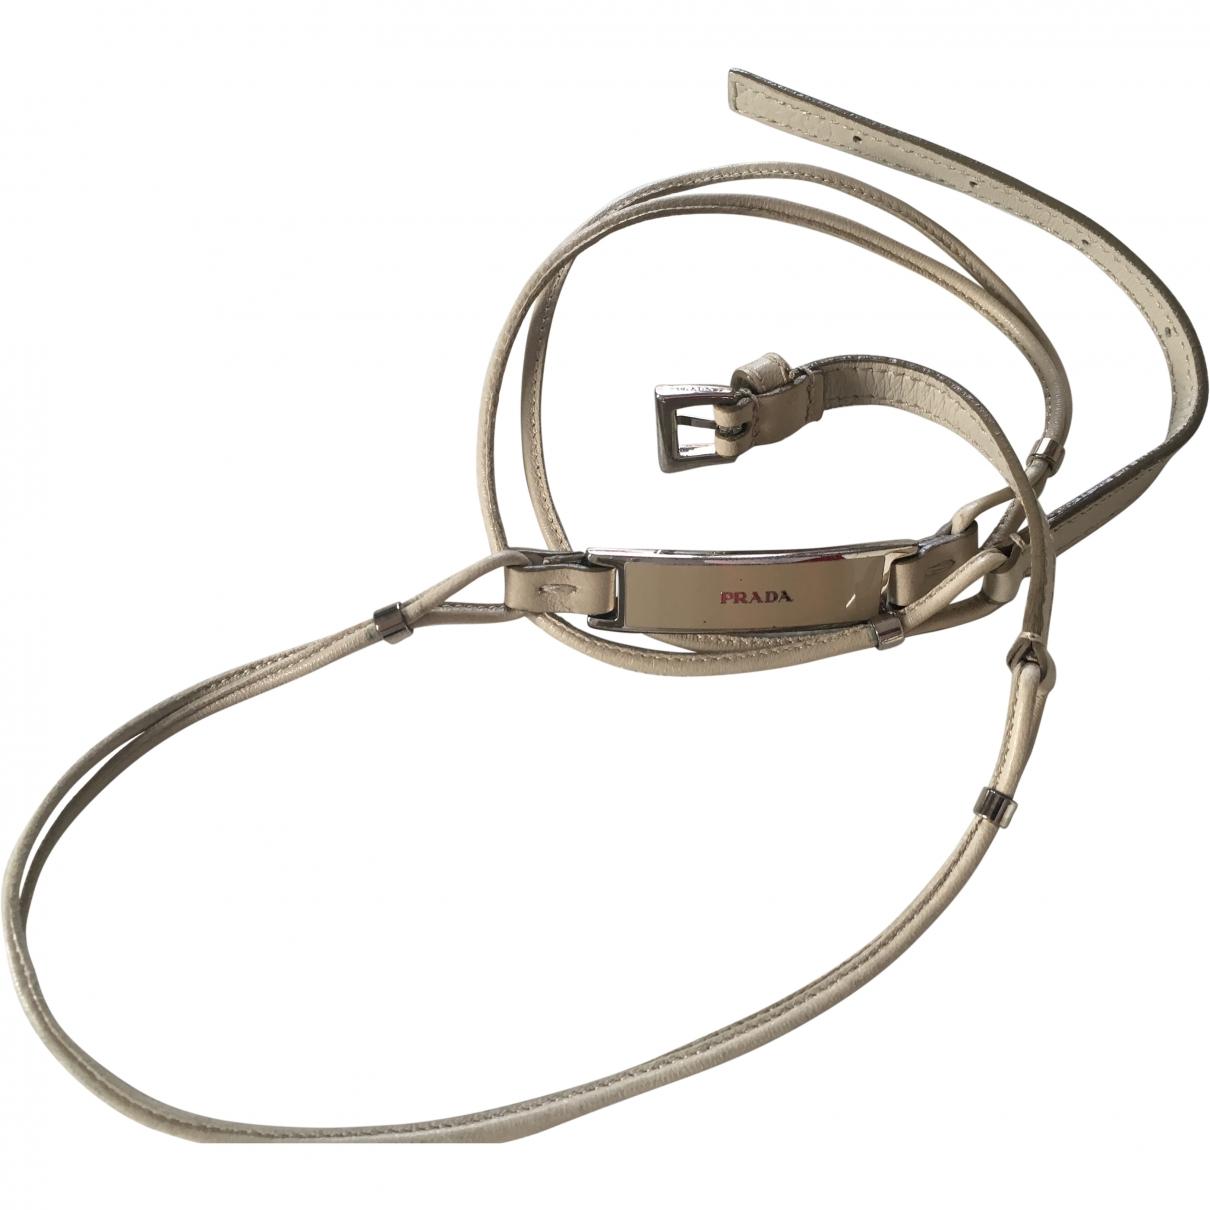 Prada \N Beige Leather belt for Women 80 cm